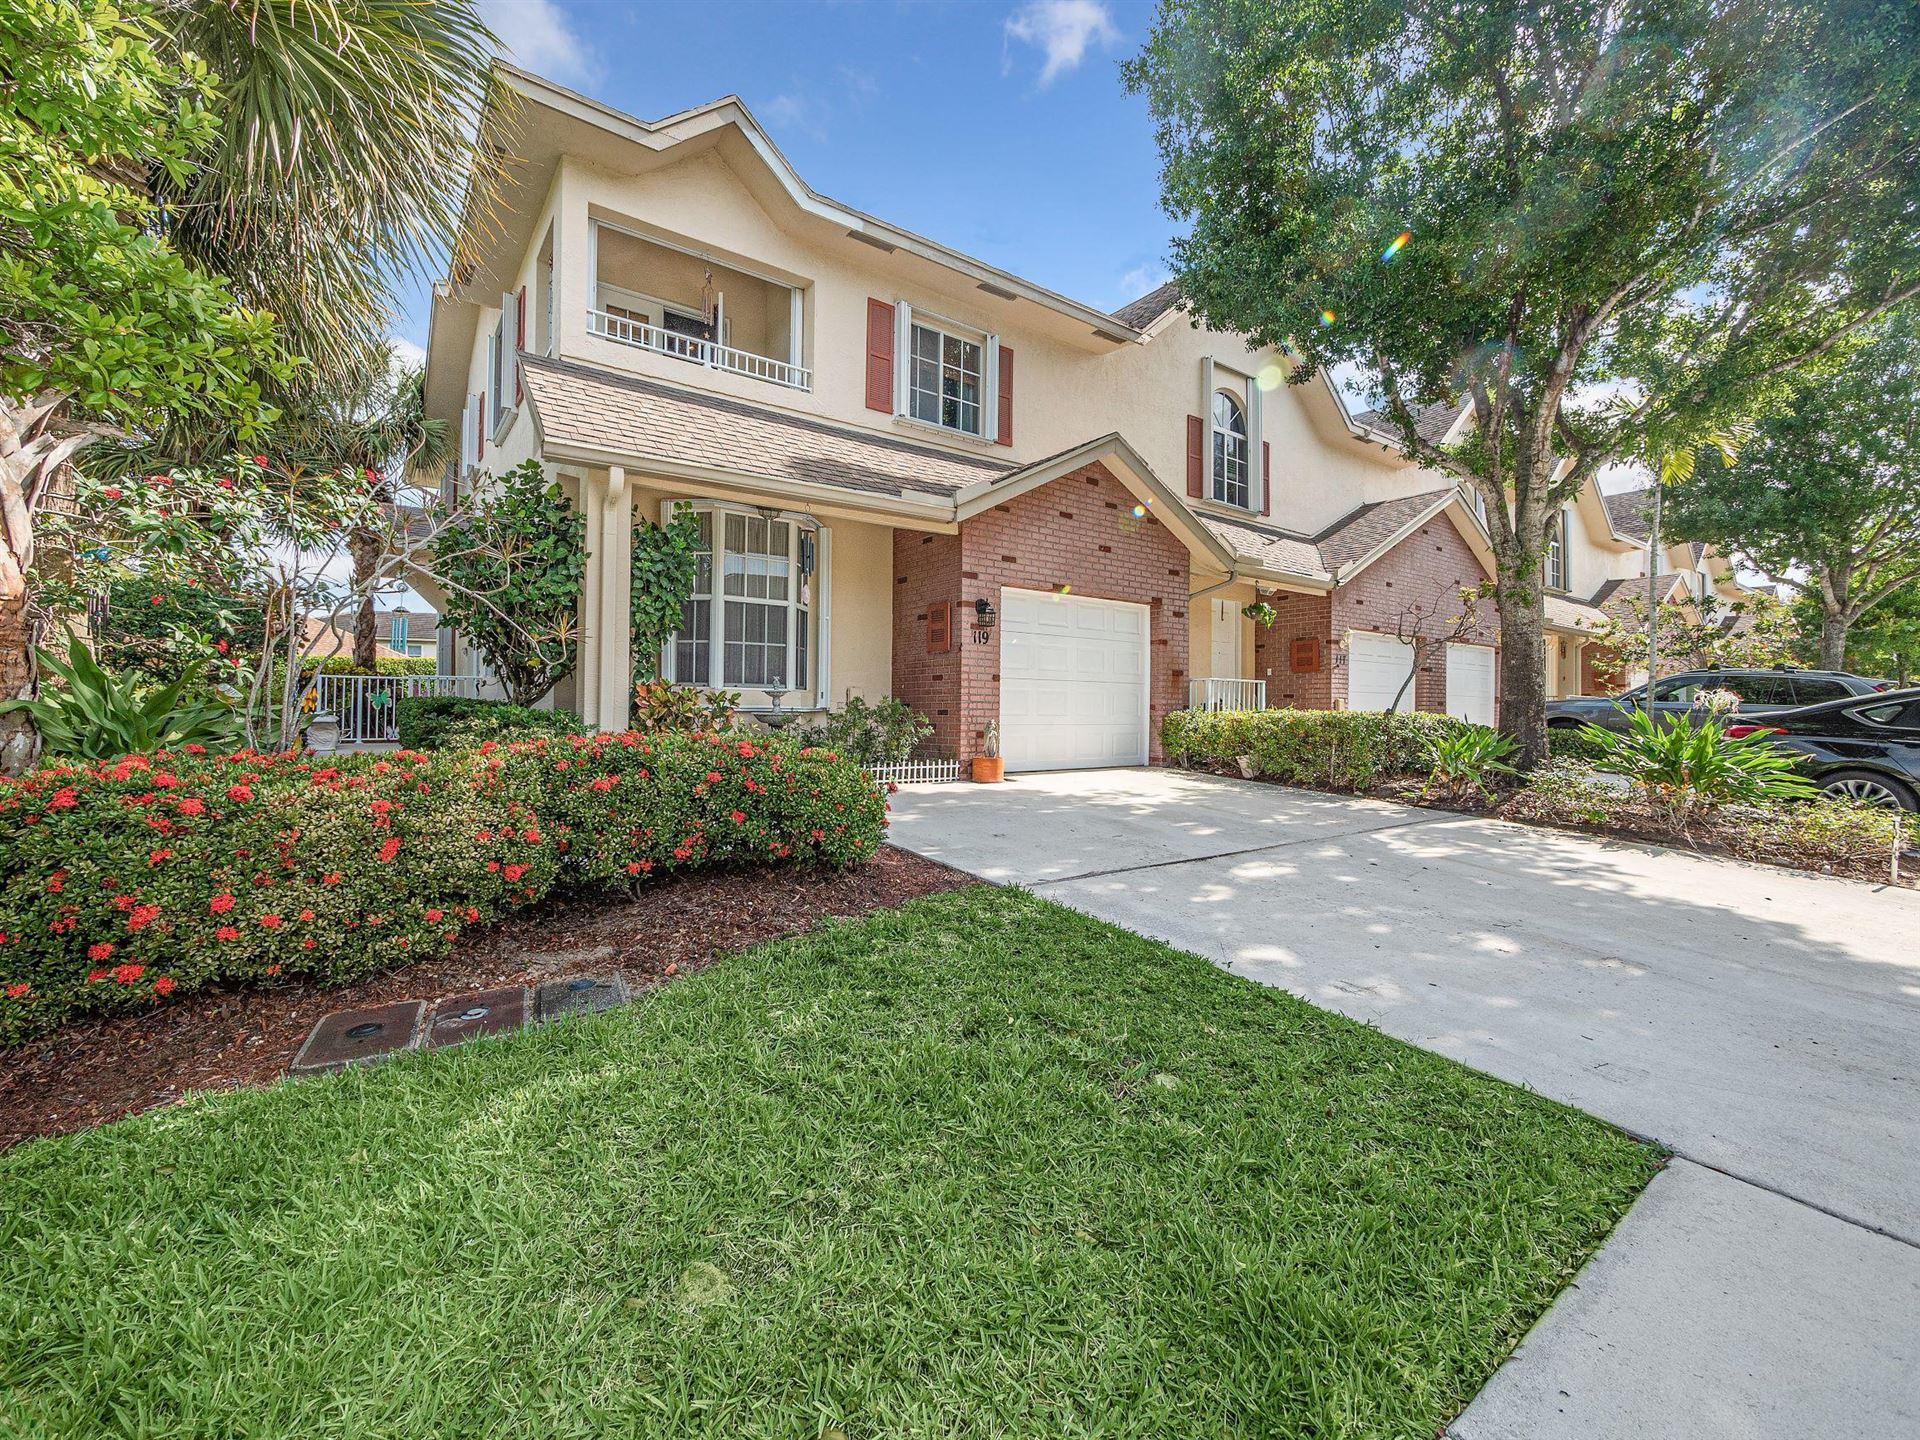 119 Spruce Street, Boynton Beach, FL 33426 - MLS#: RX-10712420